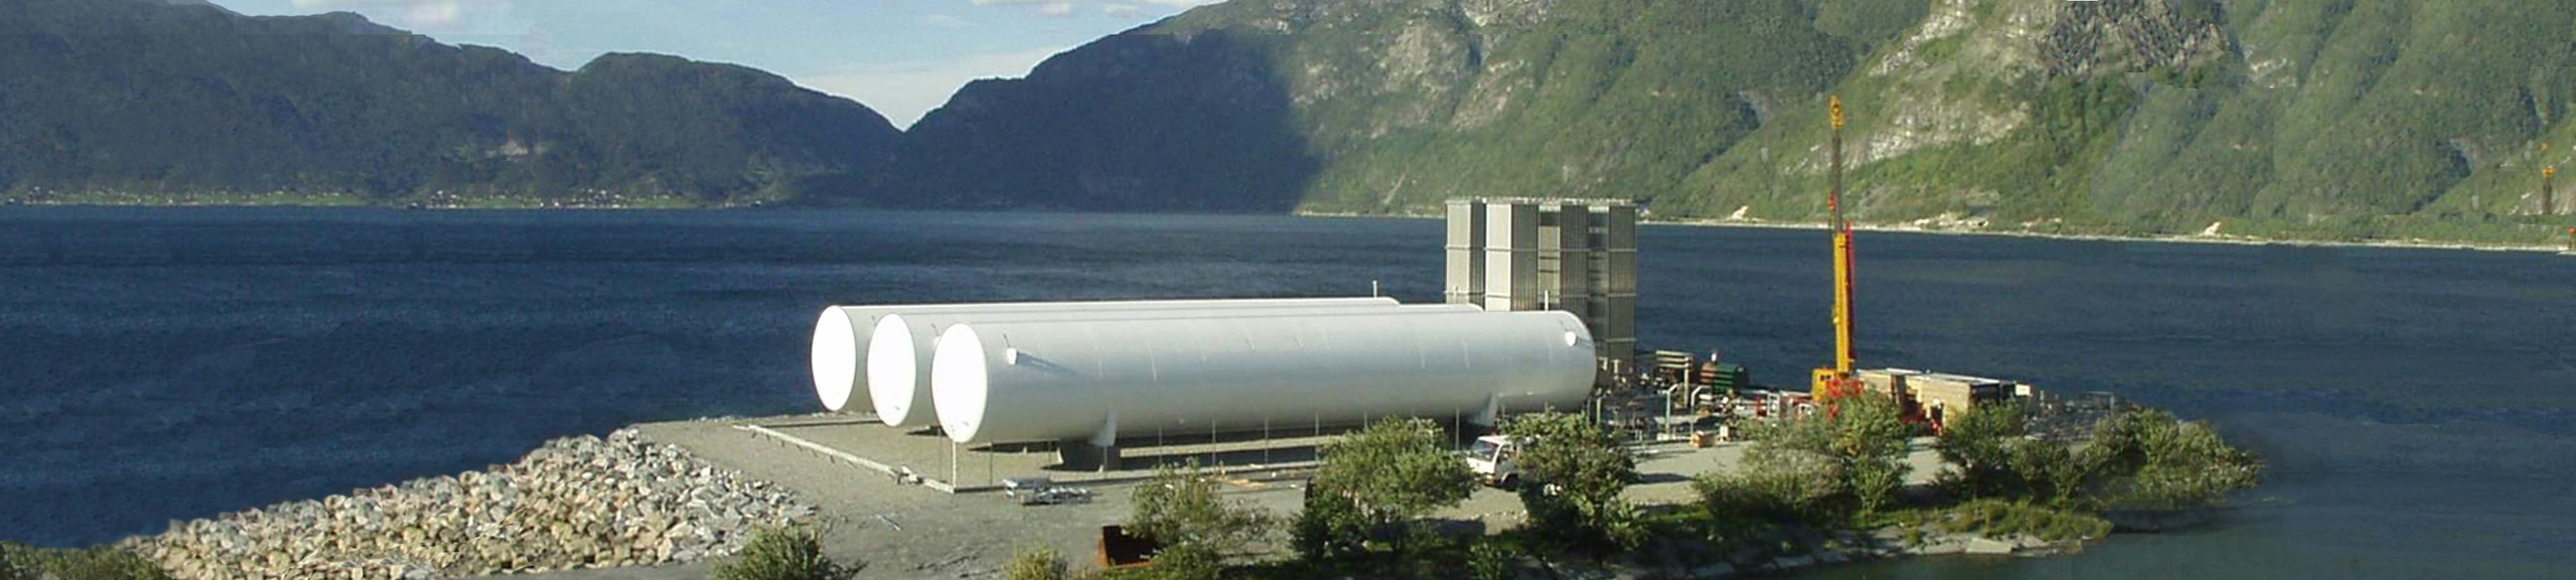 LNG Storage & Handling - LNG Terminal Engineering - EPC_.jpg